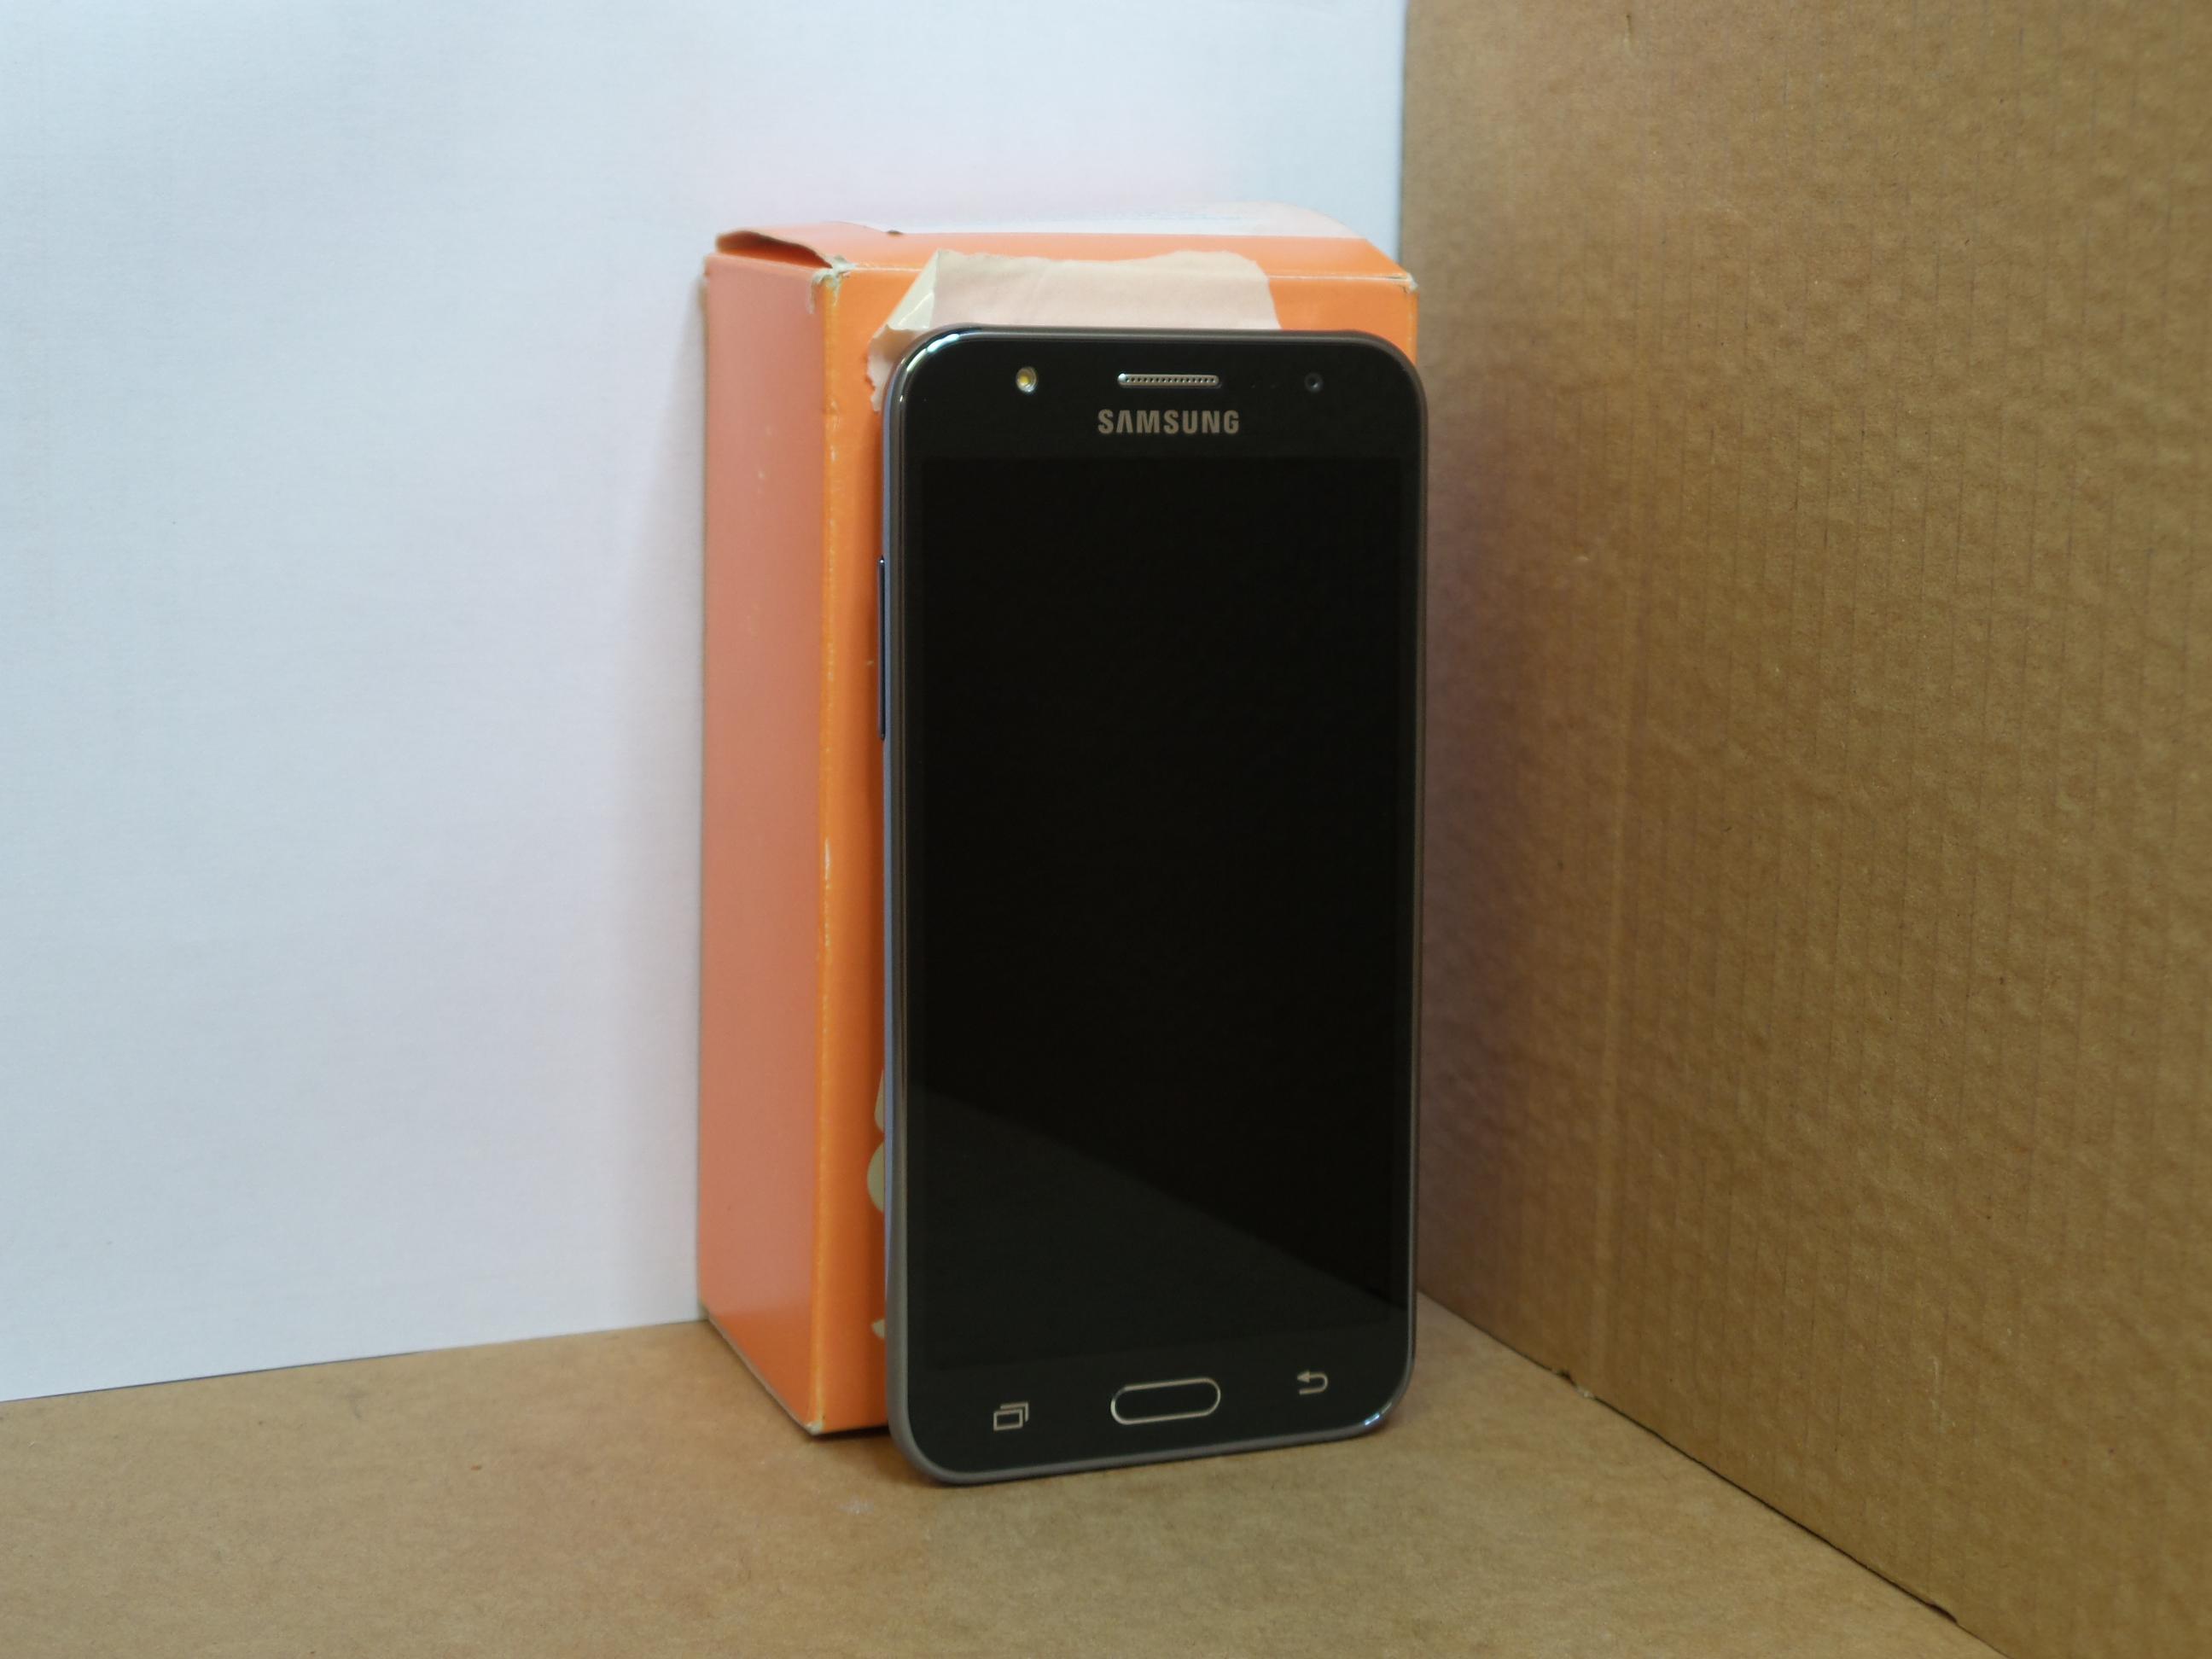 samsung galaxy j5 8gb black smartphone unlocked. Black Bedroom Furniture Sets. Home Design Ideas